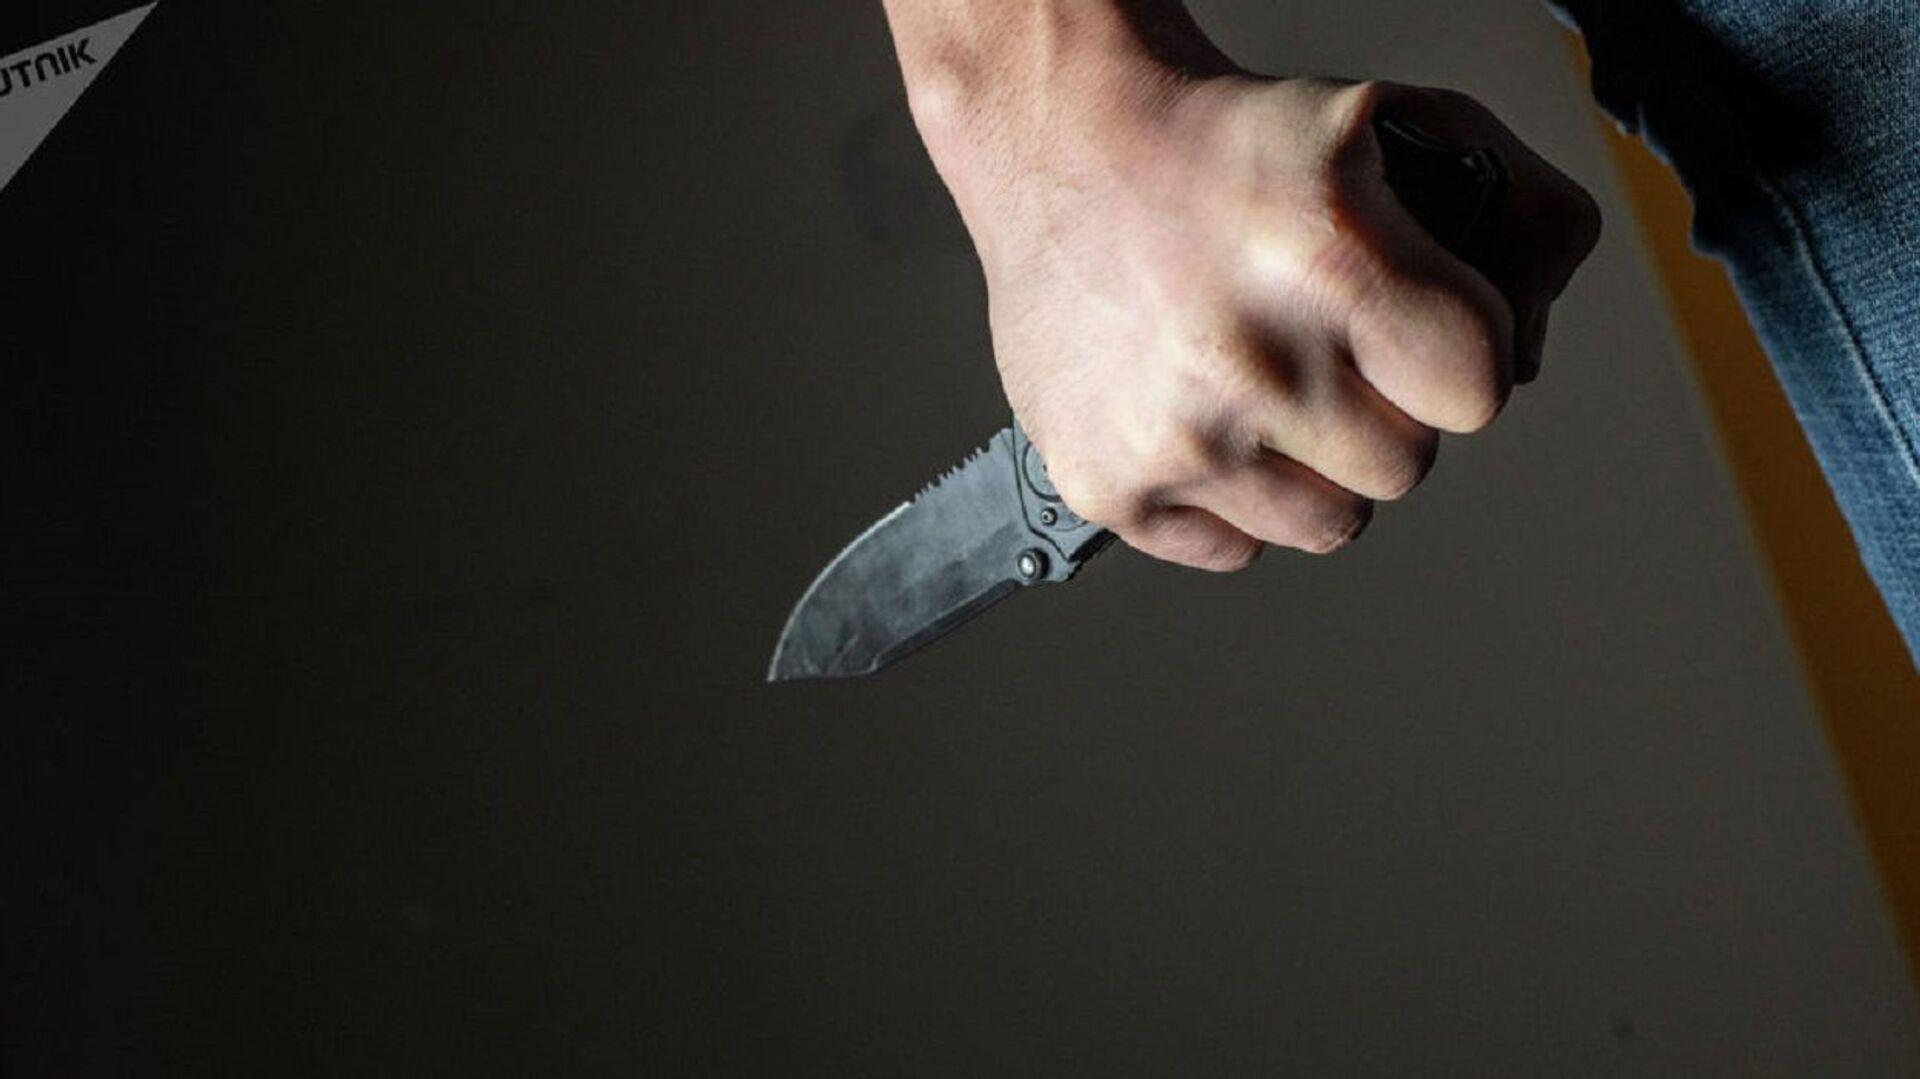 Нож в руке - Sputnik Ўзбекистон, 1920, 05.10.2021